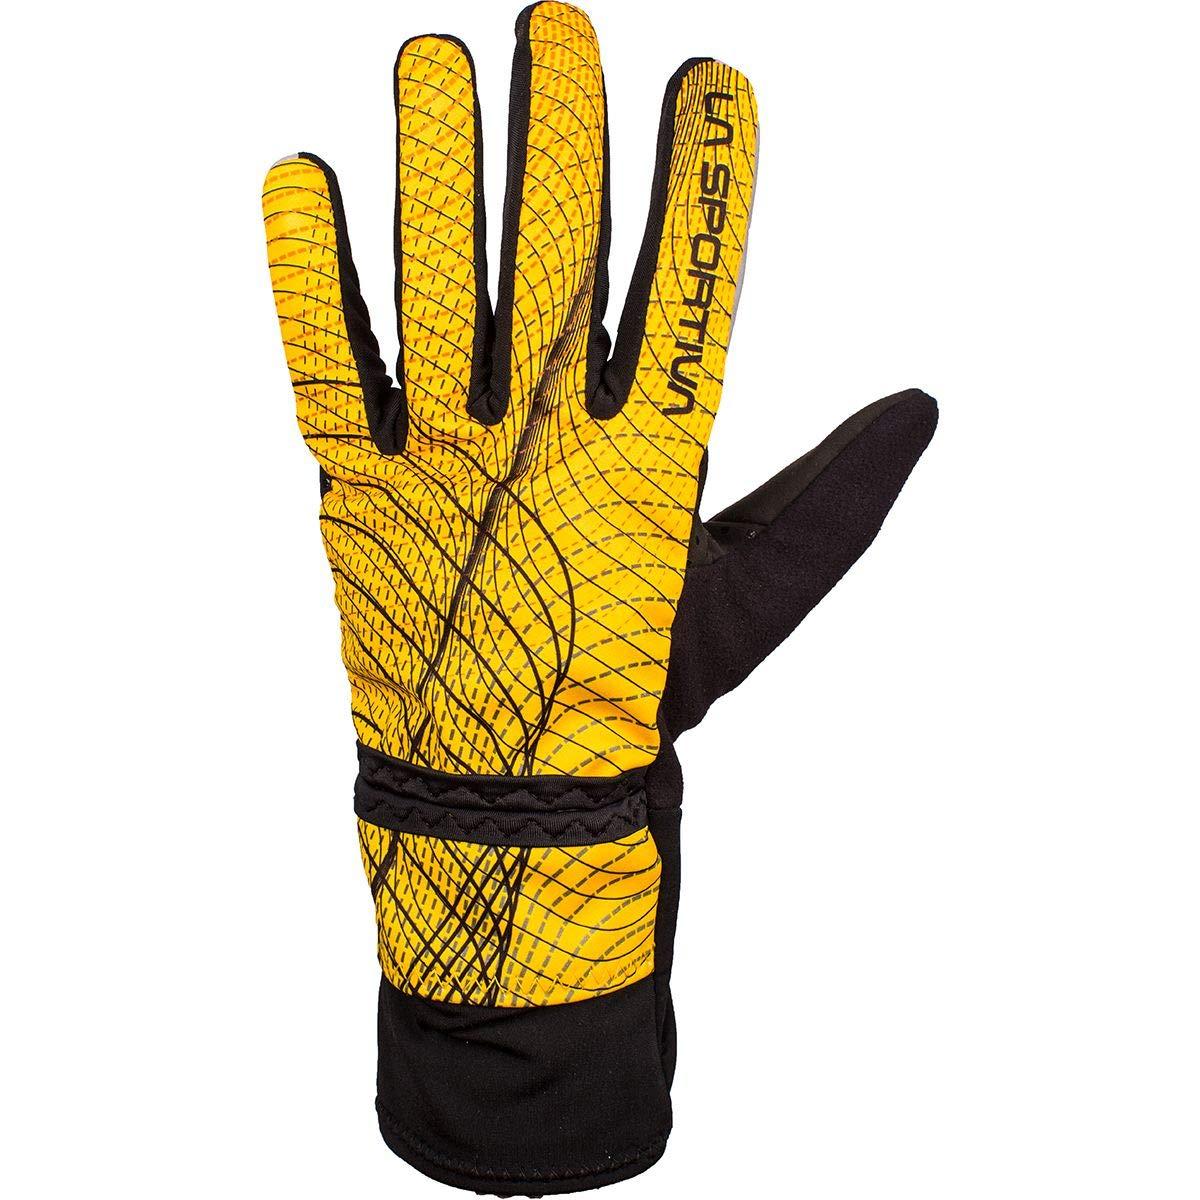 La Sportiva Winter Running Glove M Handschuhe, Herren